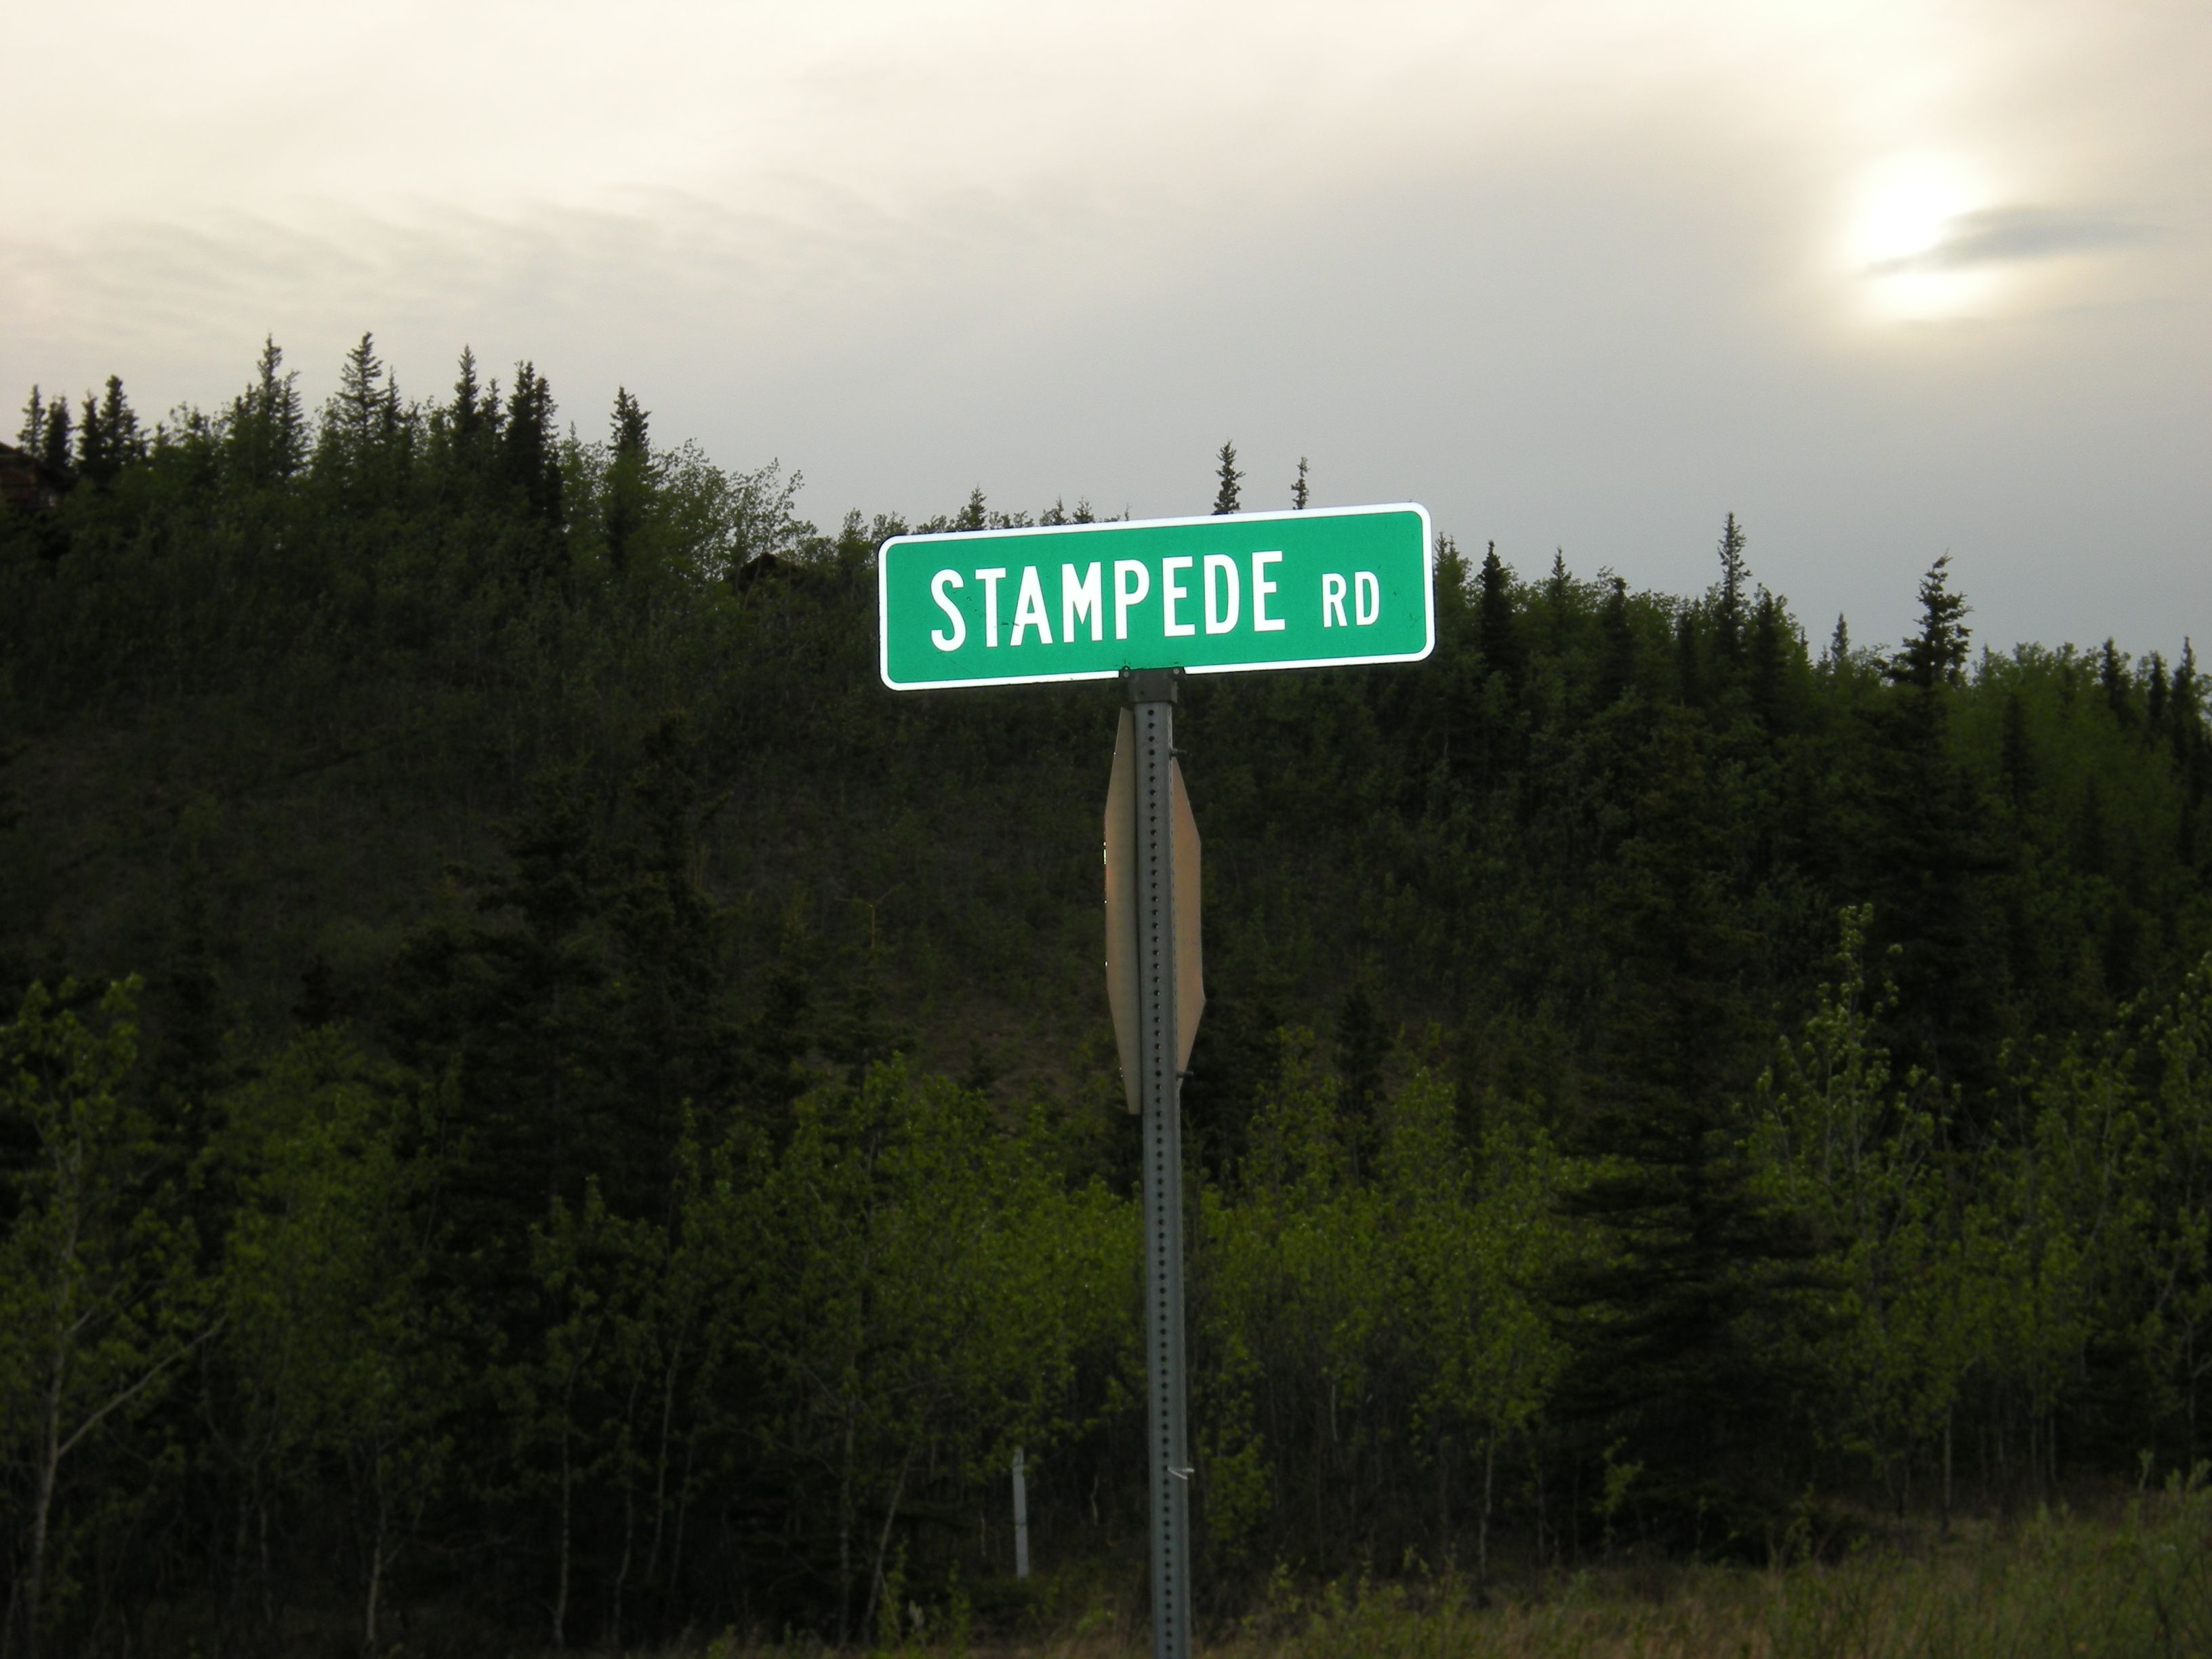 Stampede Rd. ~  Denali, Alaska ~ 'INTO THE WILD'